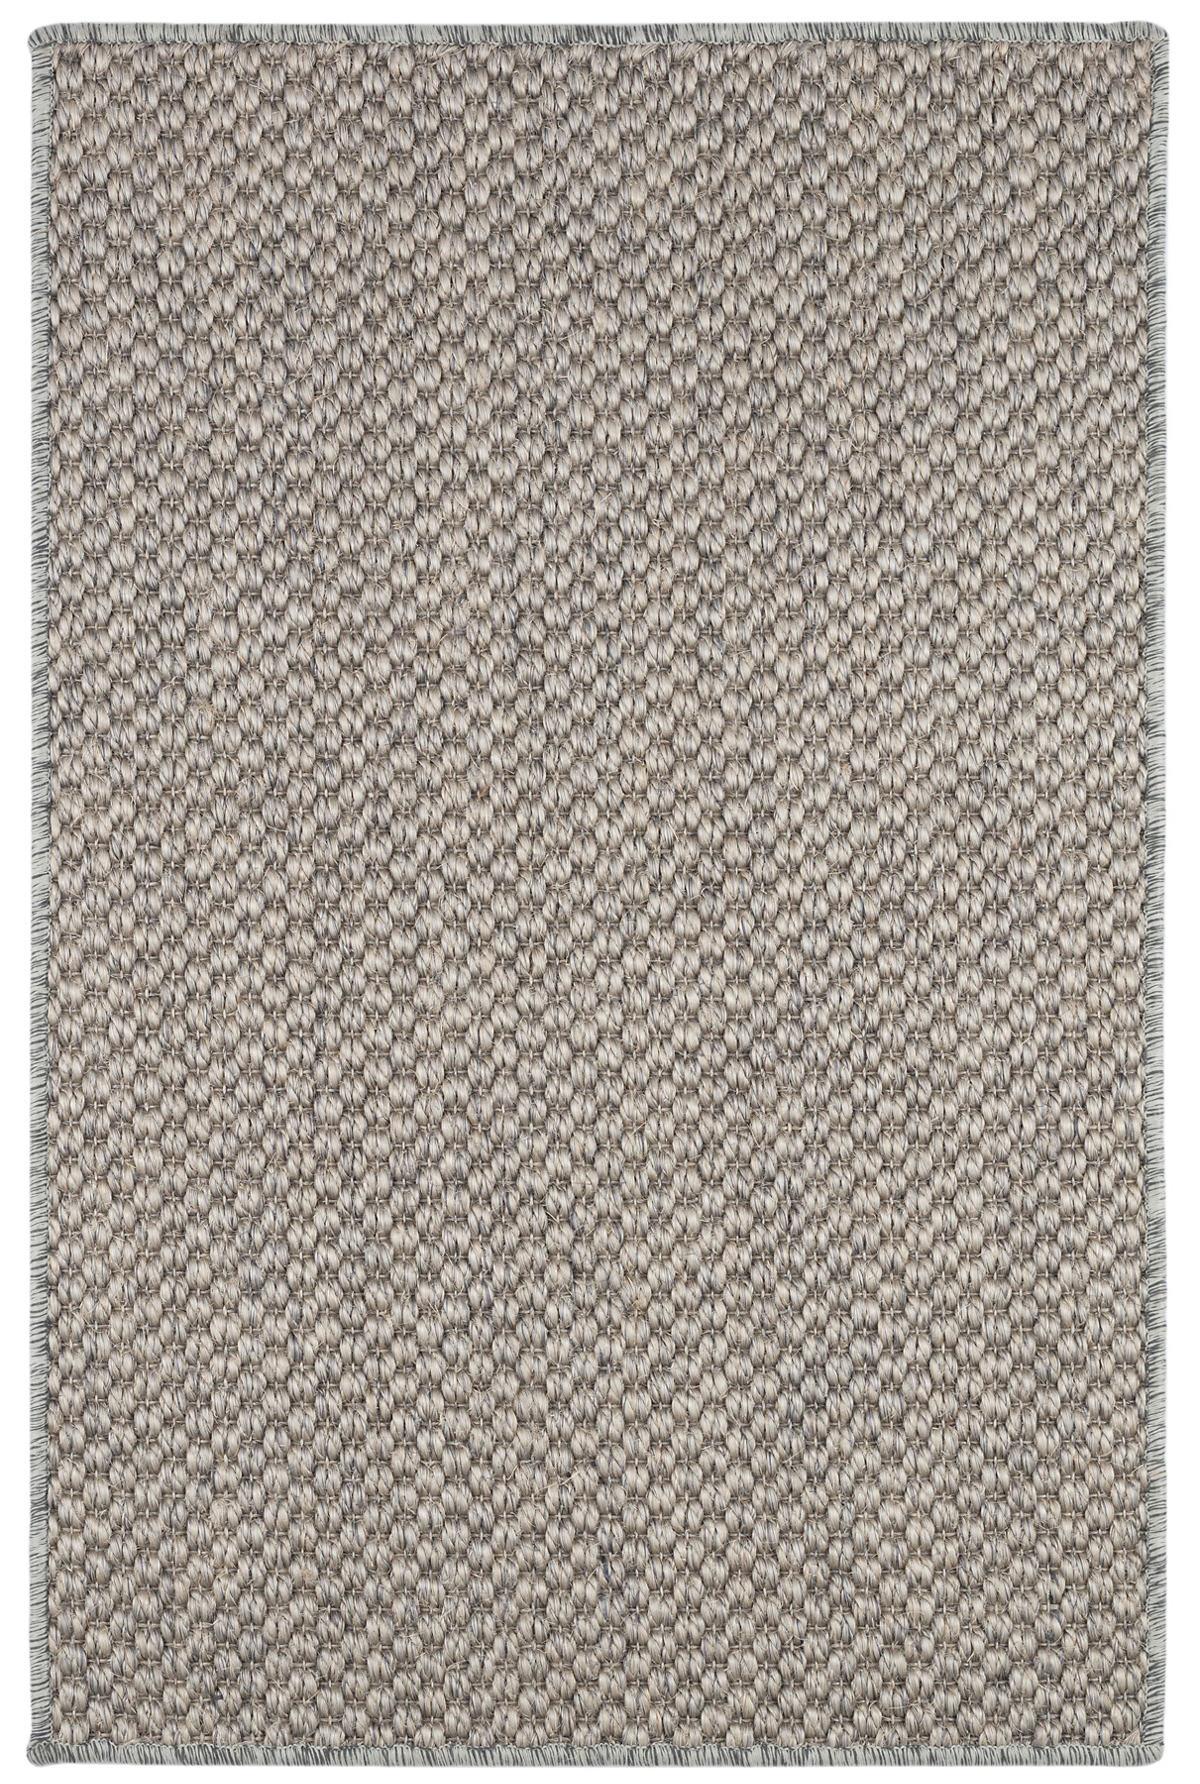 Corden Silver Woven Sisal Custom Rug